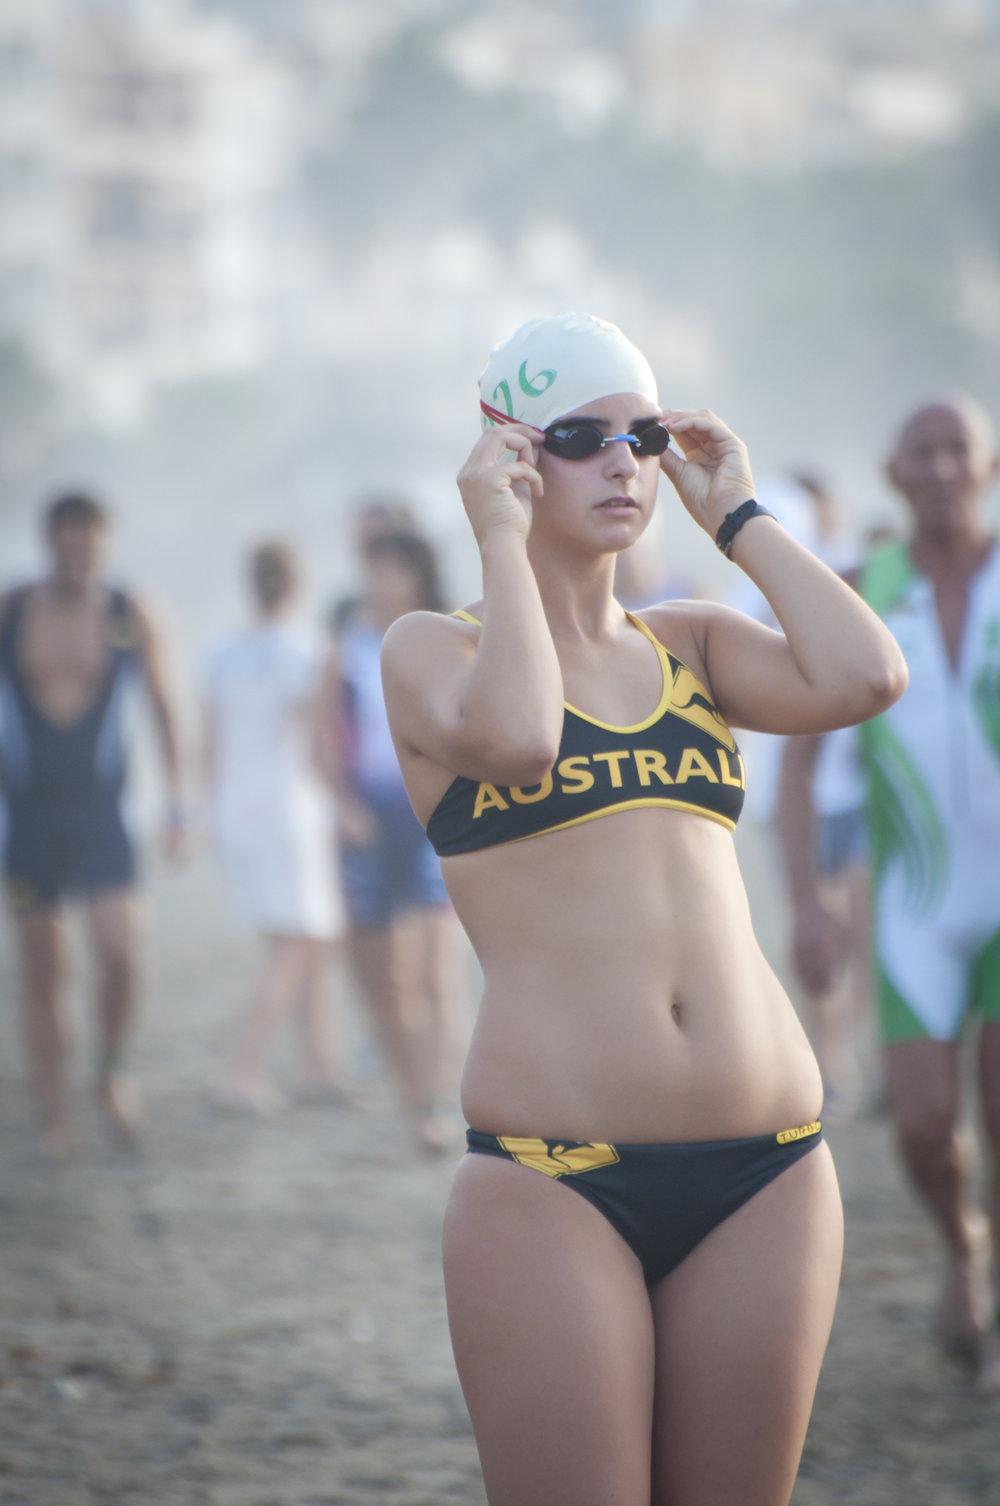 Estepona Triathlon 2011 (7 of 56).jpg